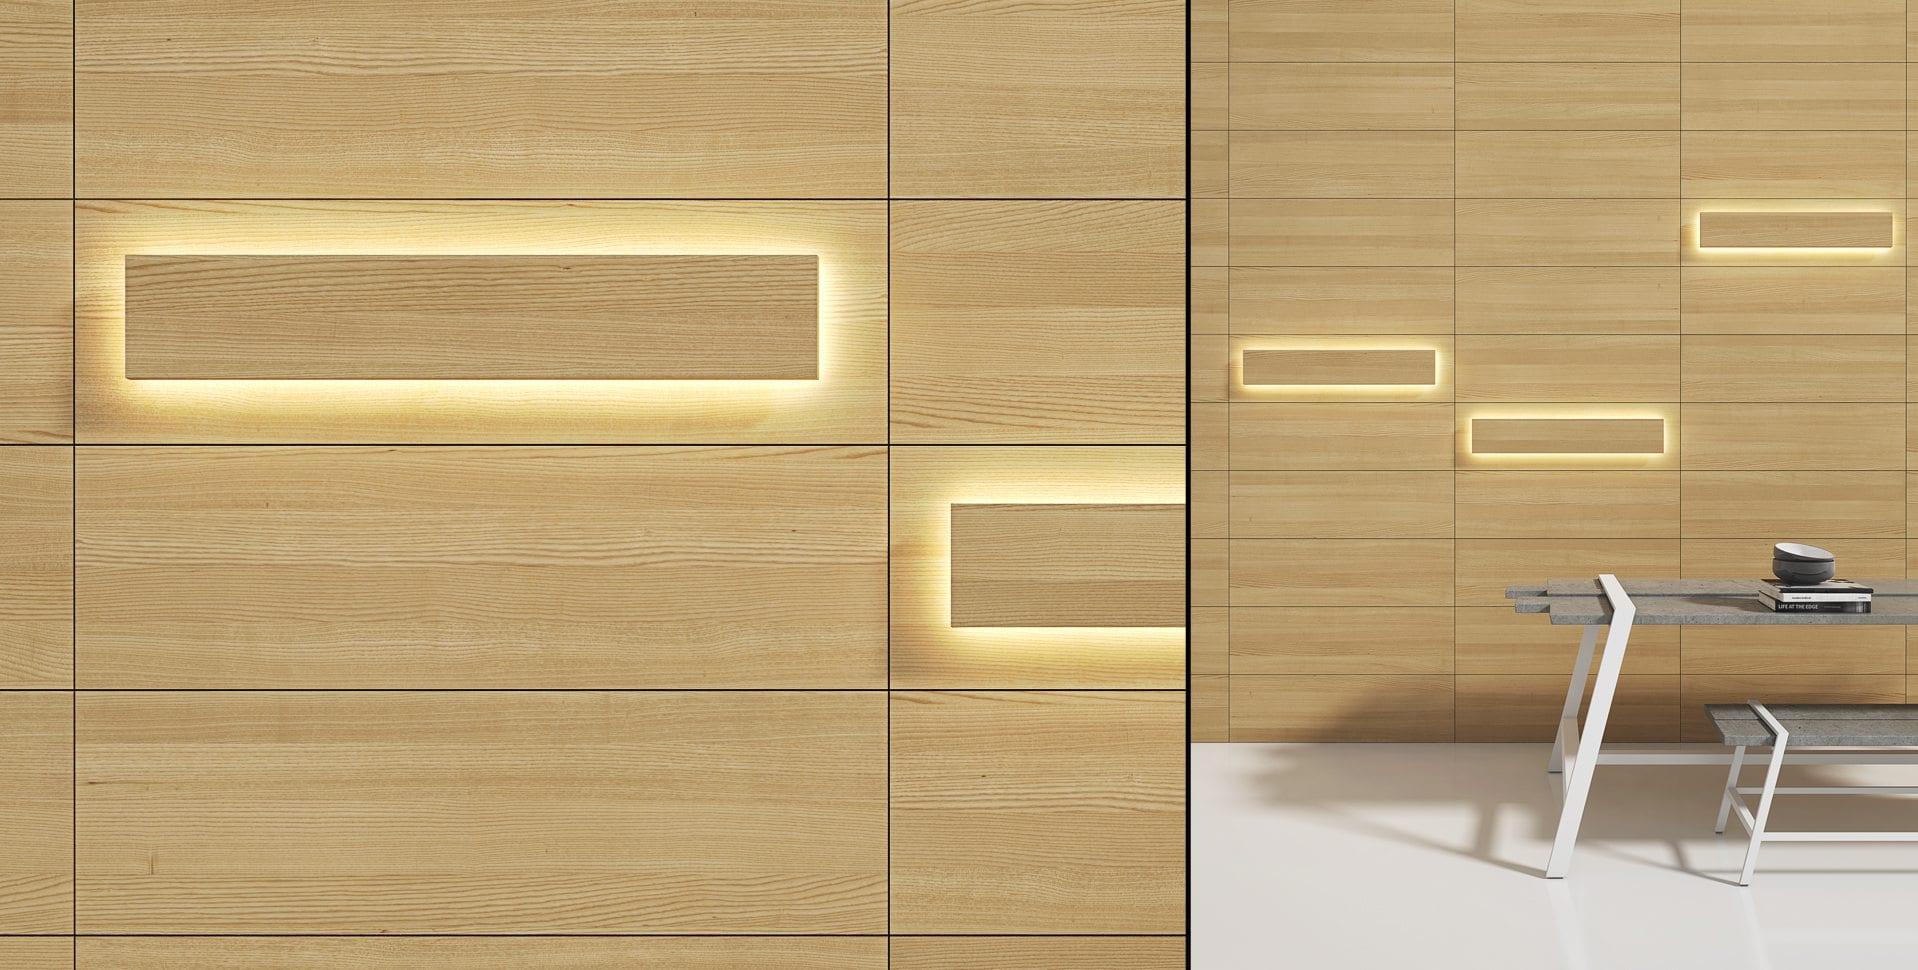 Maayan-Golan_Architectural-Visualization_product-visualization_wall-tiles_lighting-fixture_itai-bar-on_dining_07